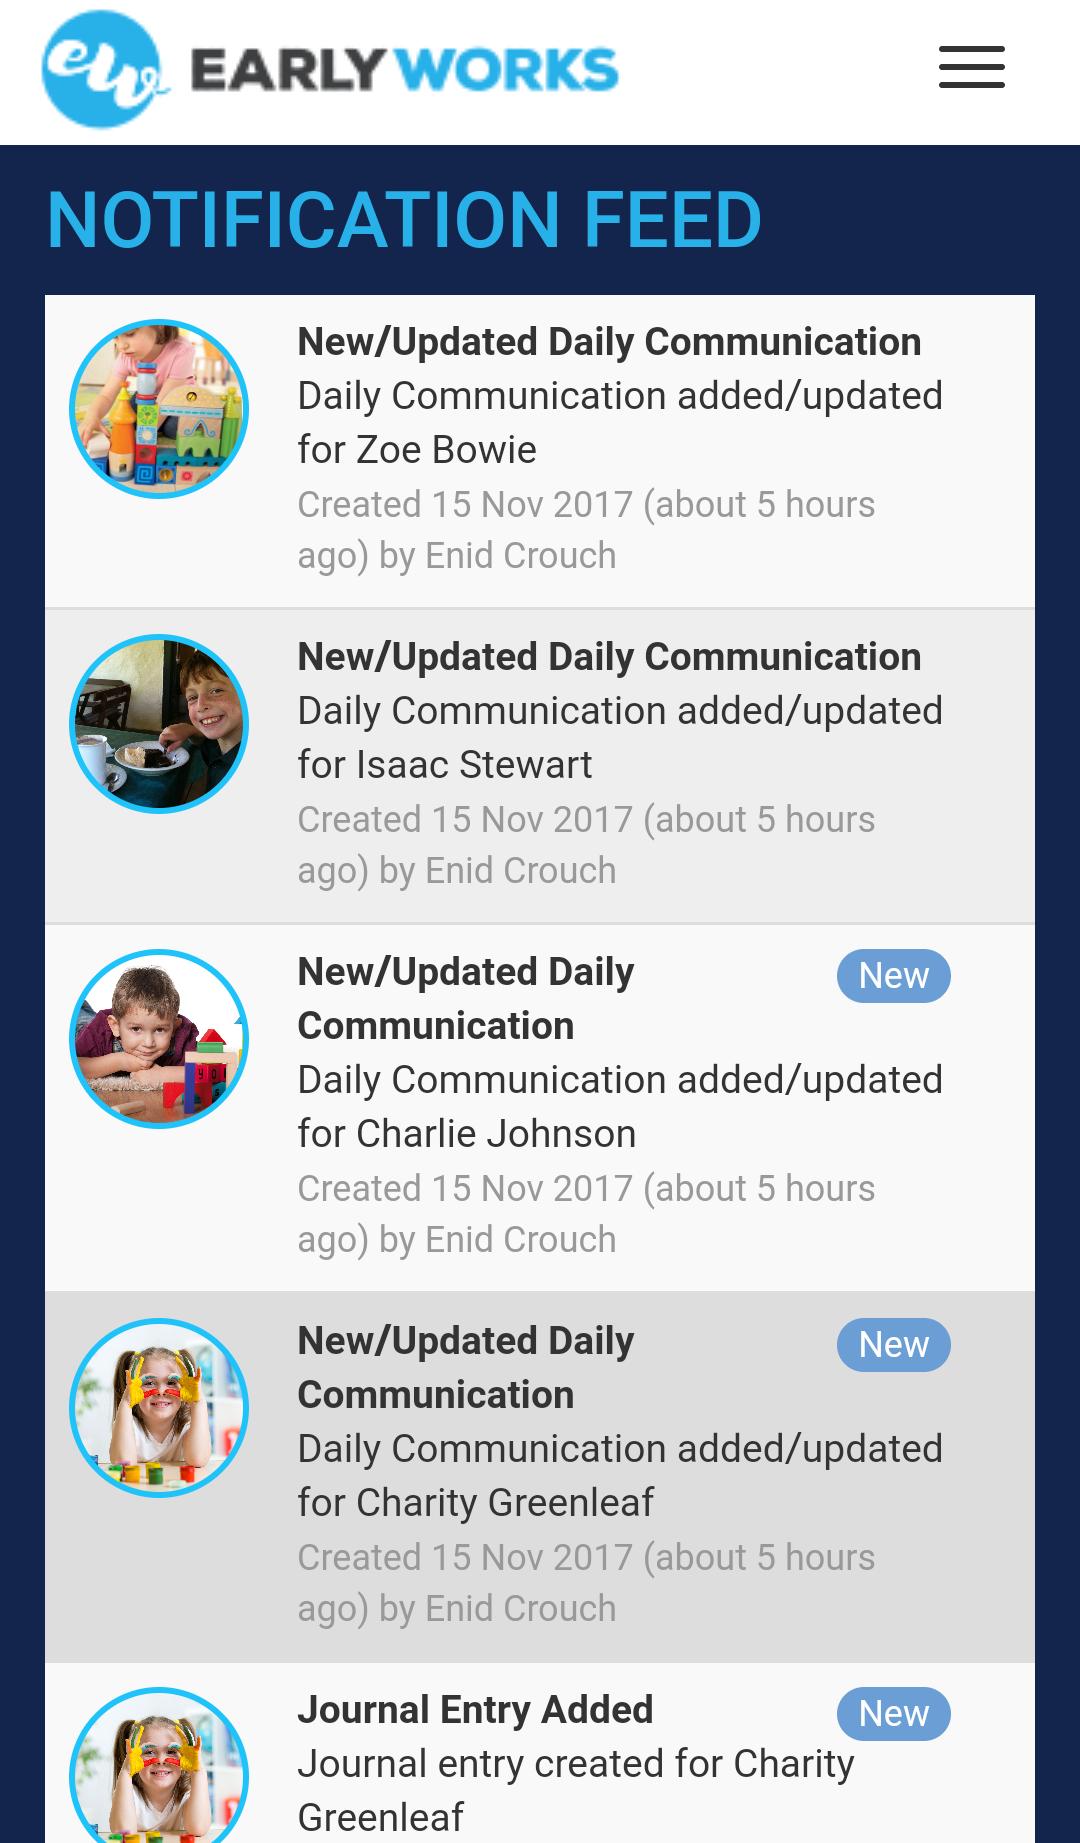 Notification feed